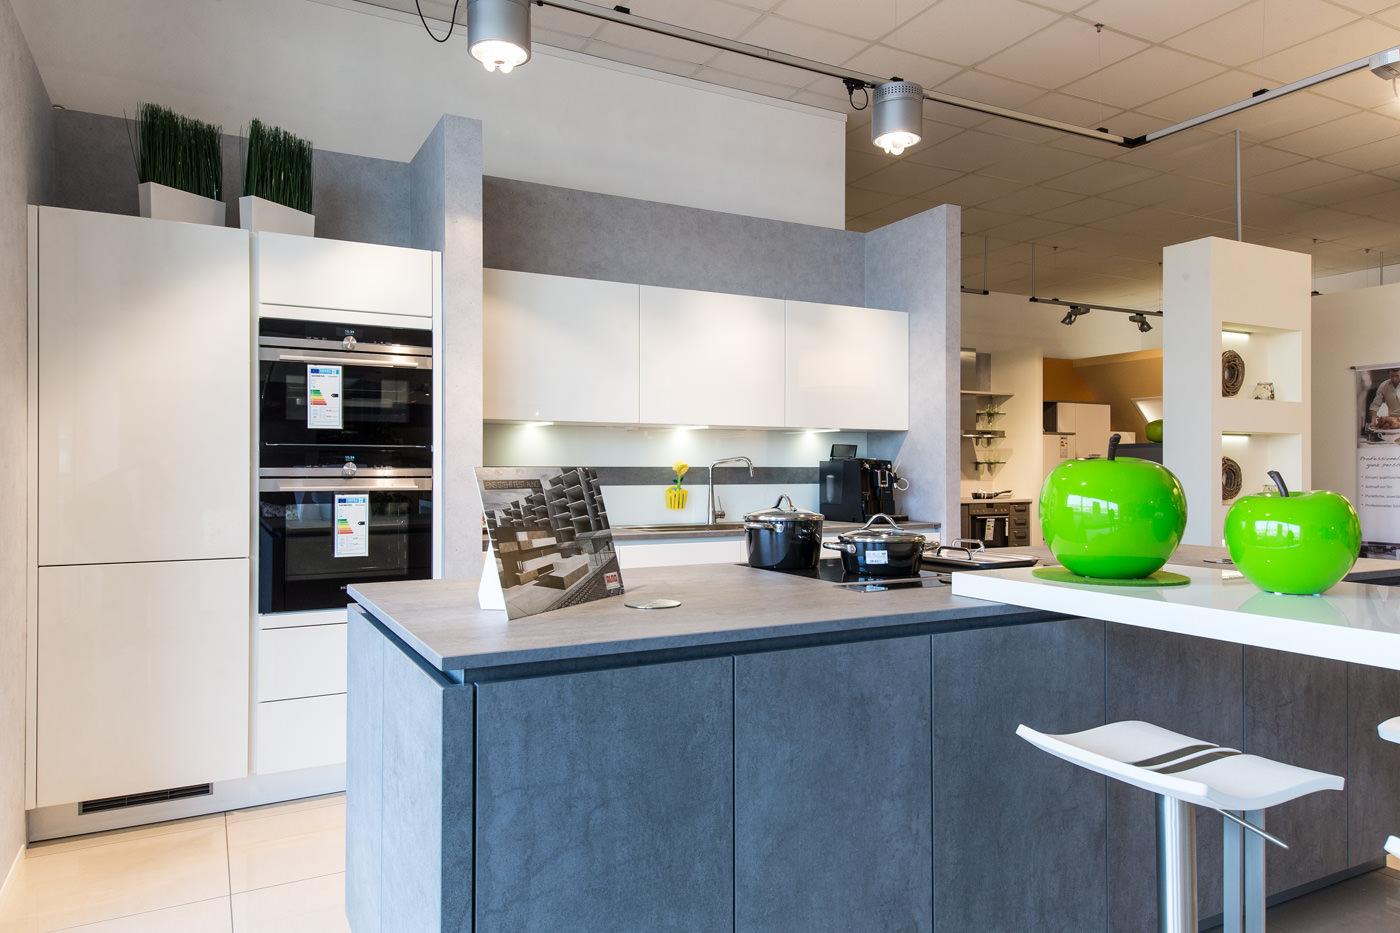 kochinsel mit tisch. Black Bedroom Furniture Sets. Home Design Ideas